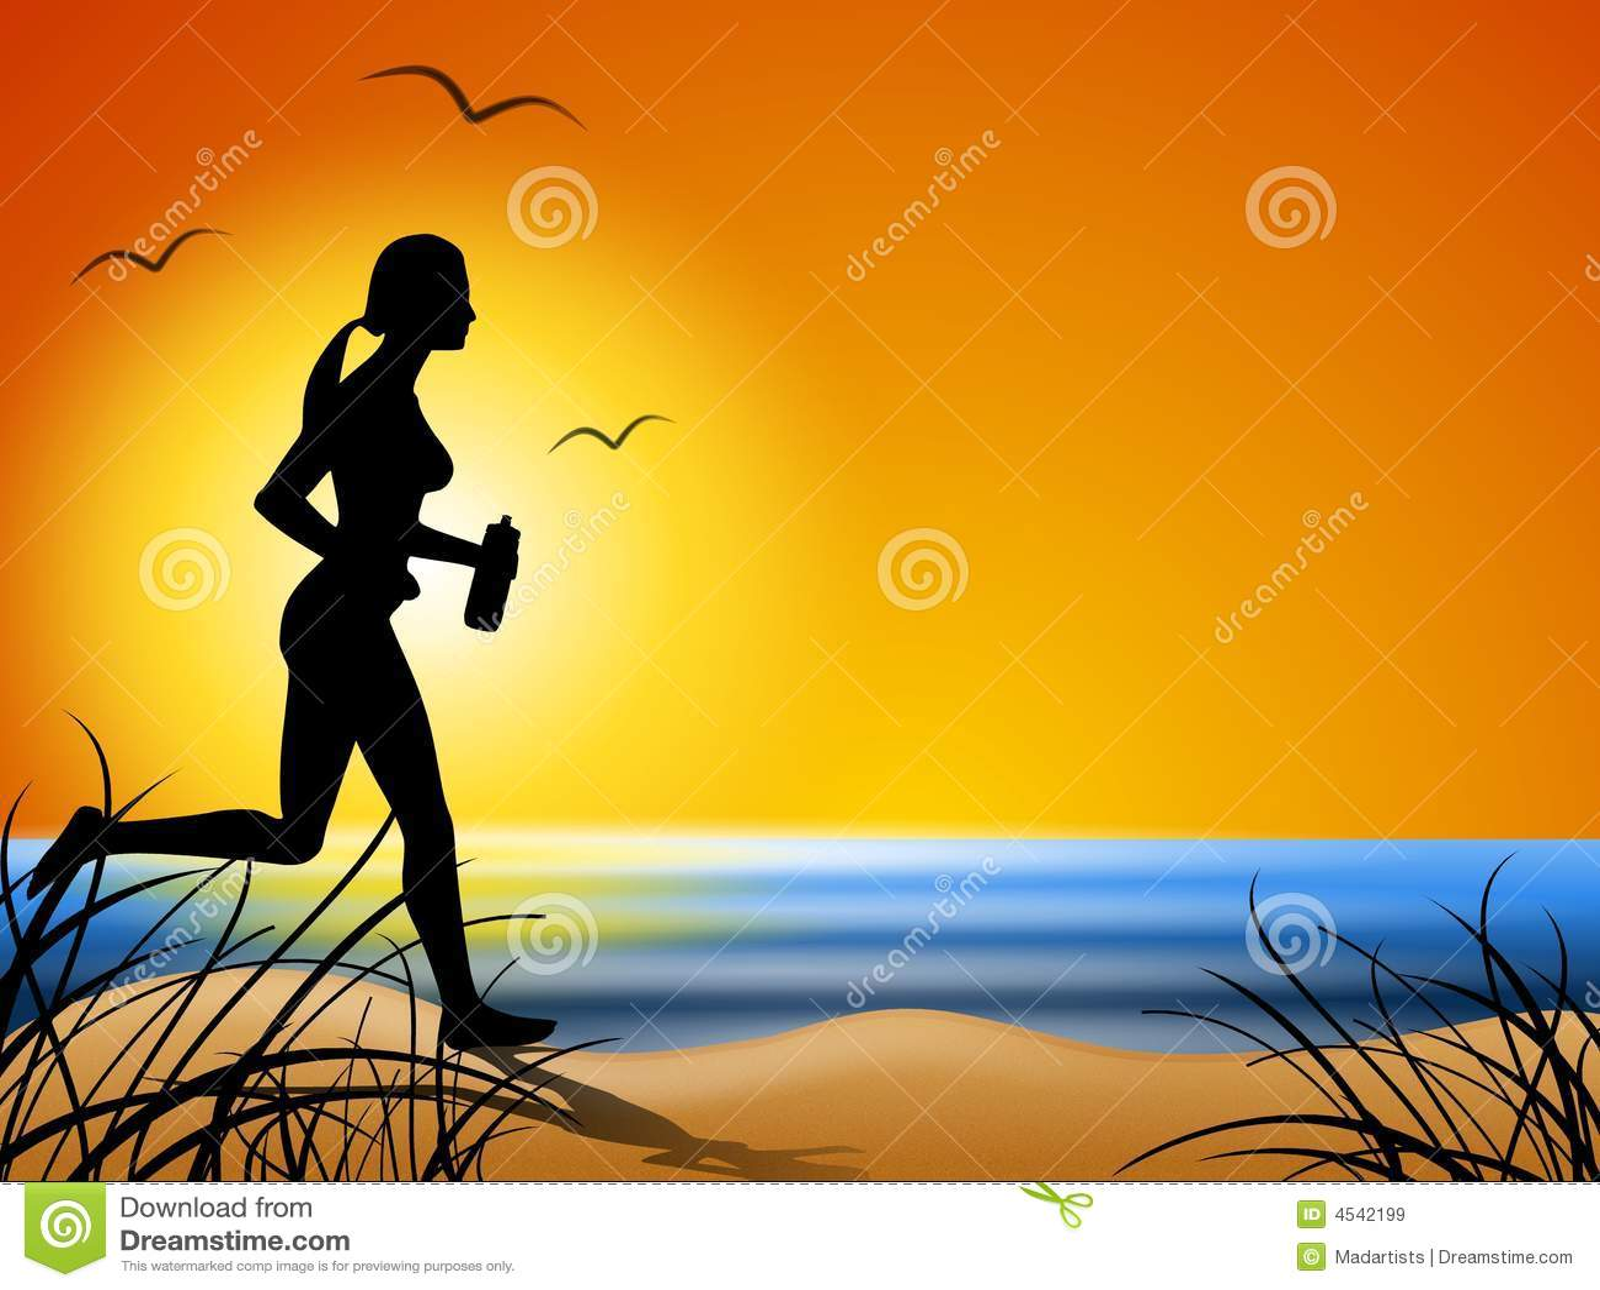 Running Along The Beach At Sunset Stock Illustration ...